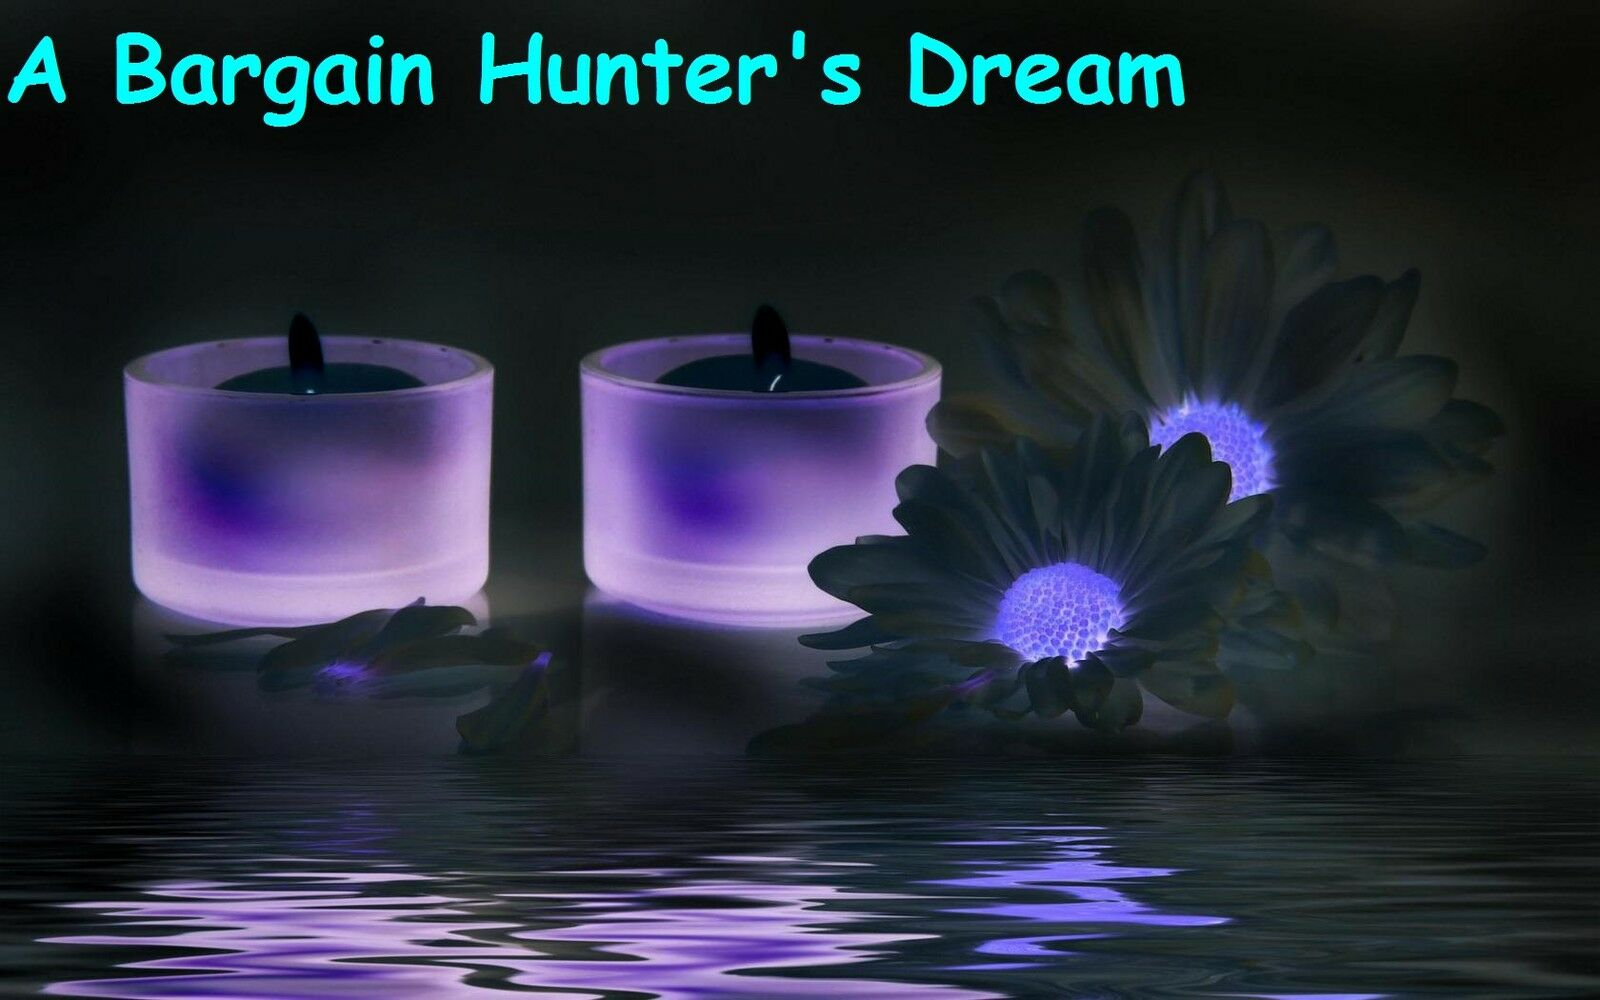 A Bargain Hunter's Dream